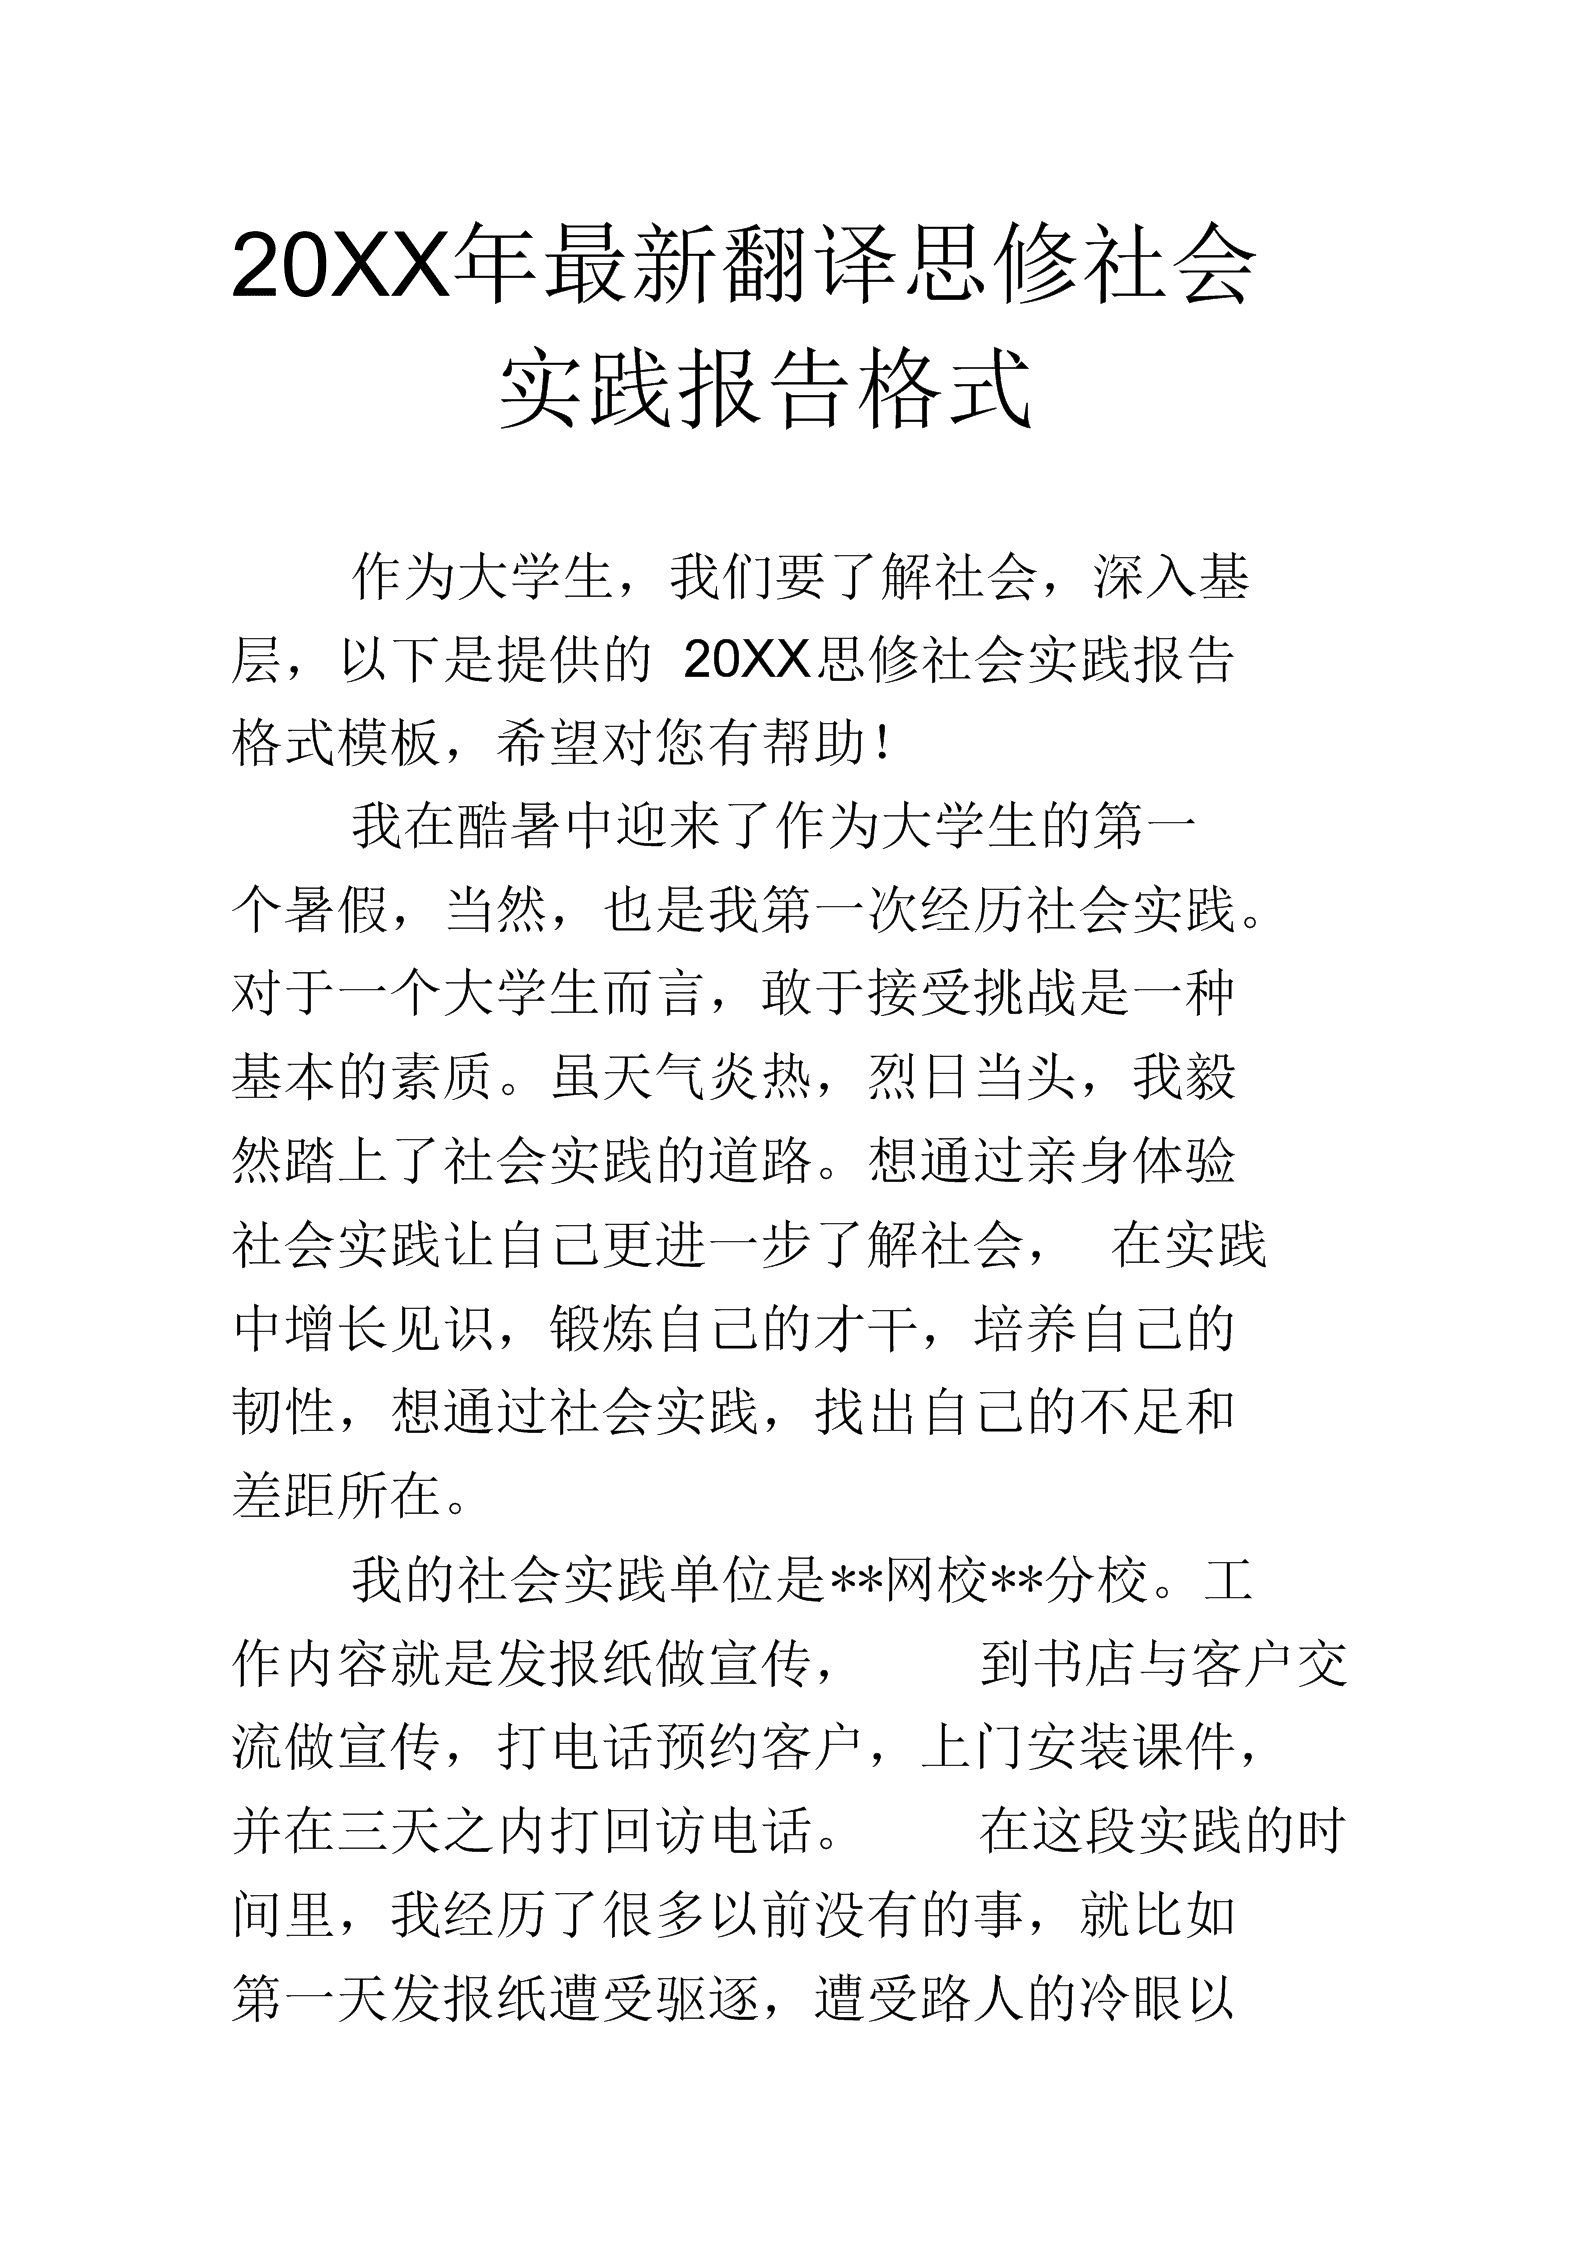 20XX年最新翻译思修社会实践报告格式.docx